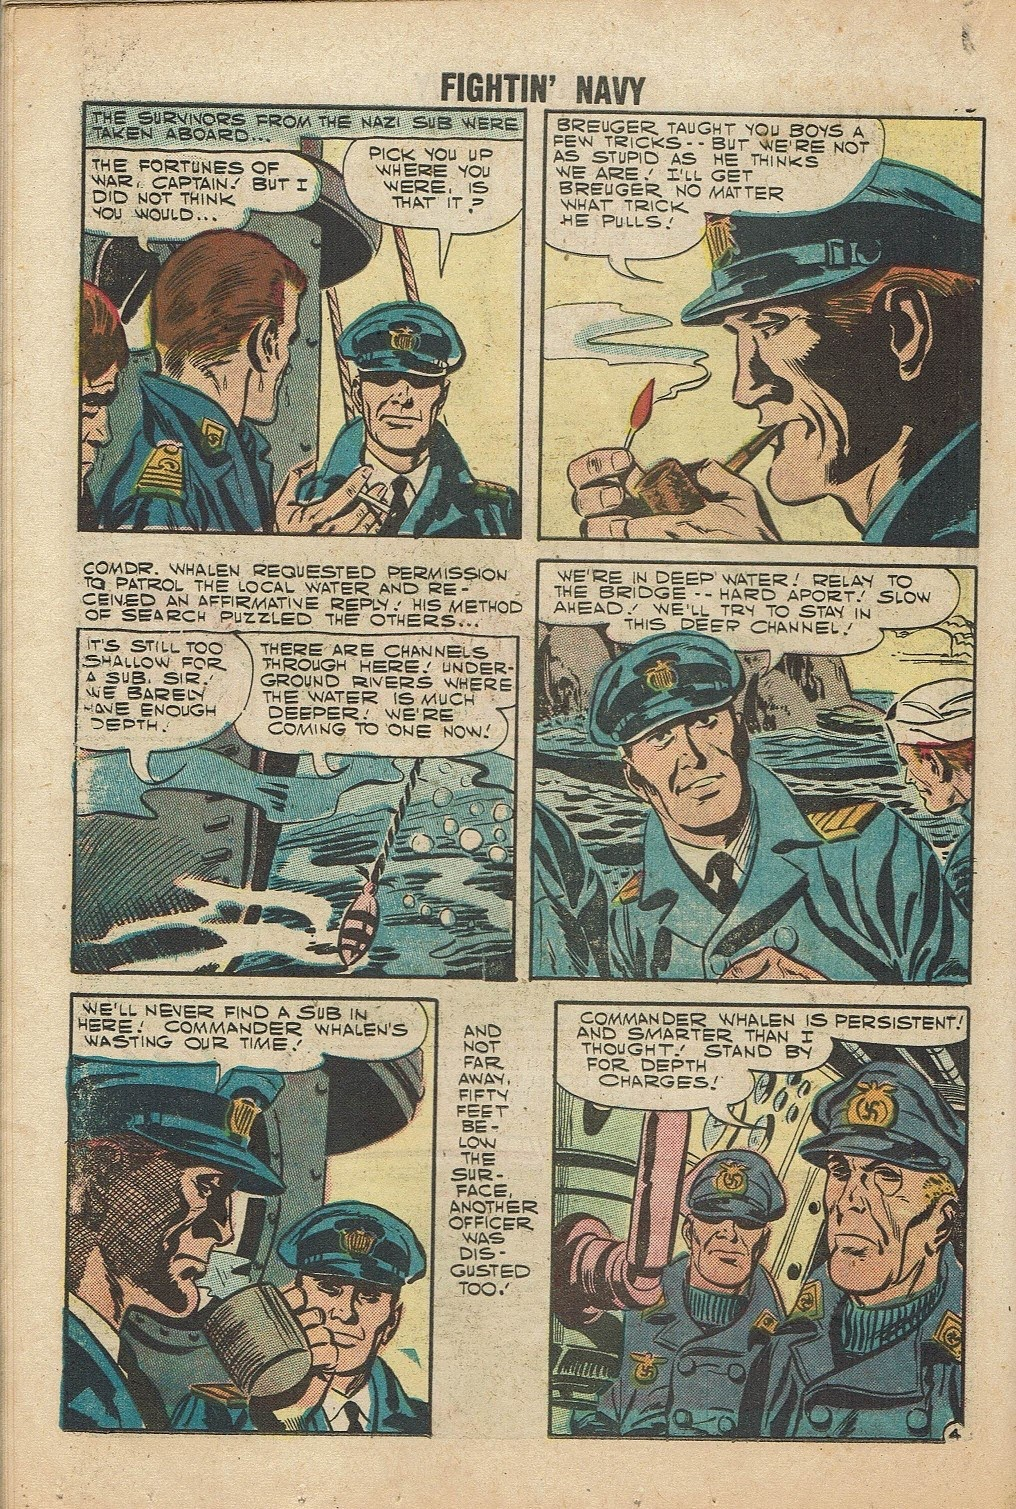 Read online Fightin' Navy comic -  Issue #81 - 18